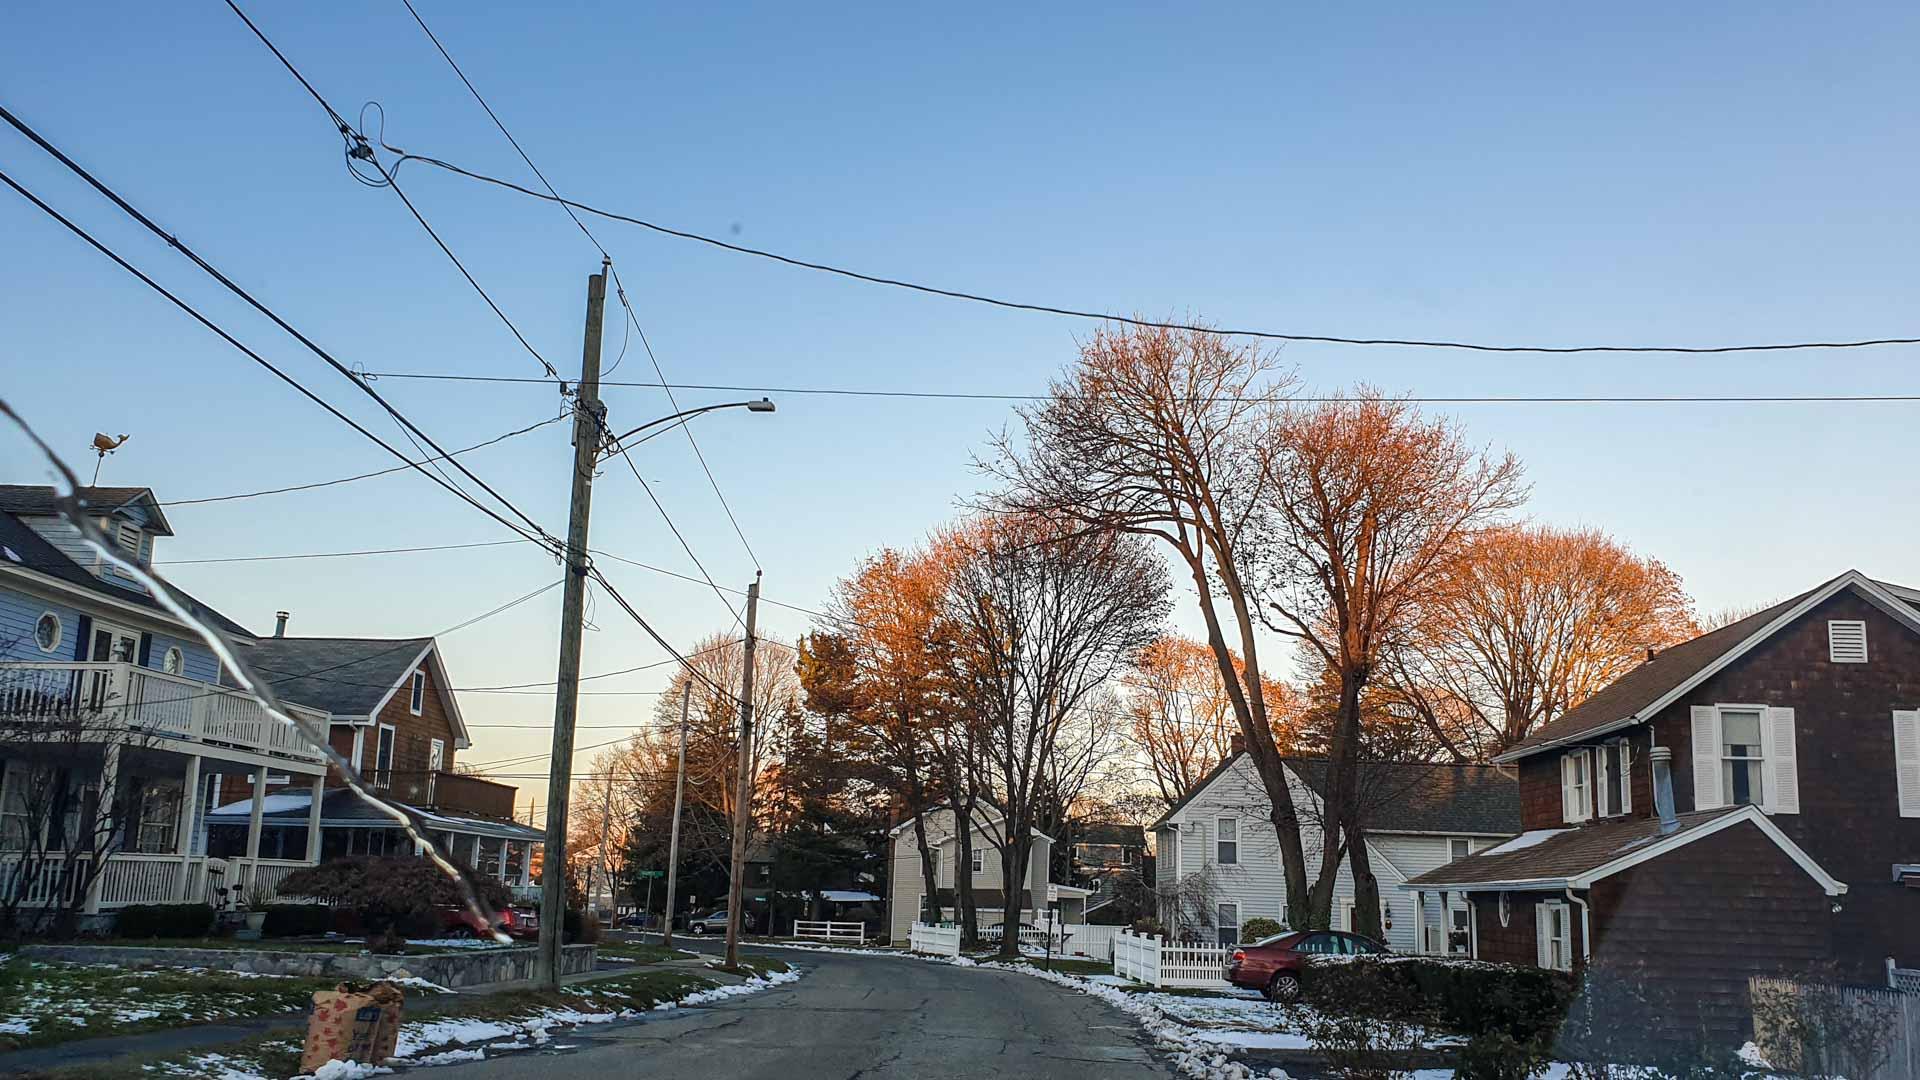 rúa desde un barrio residencial en Milford, Connecticut